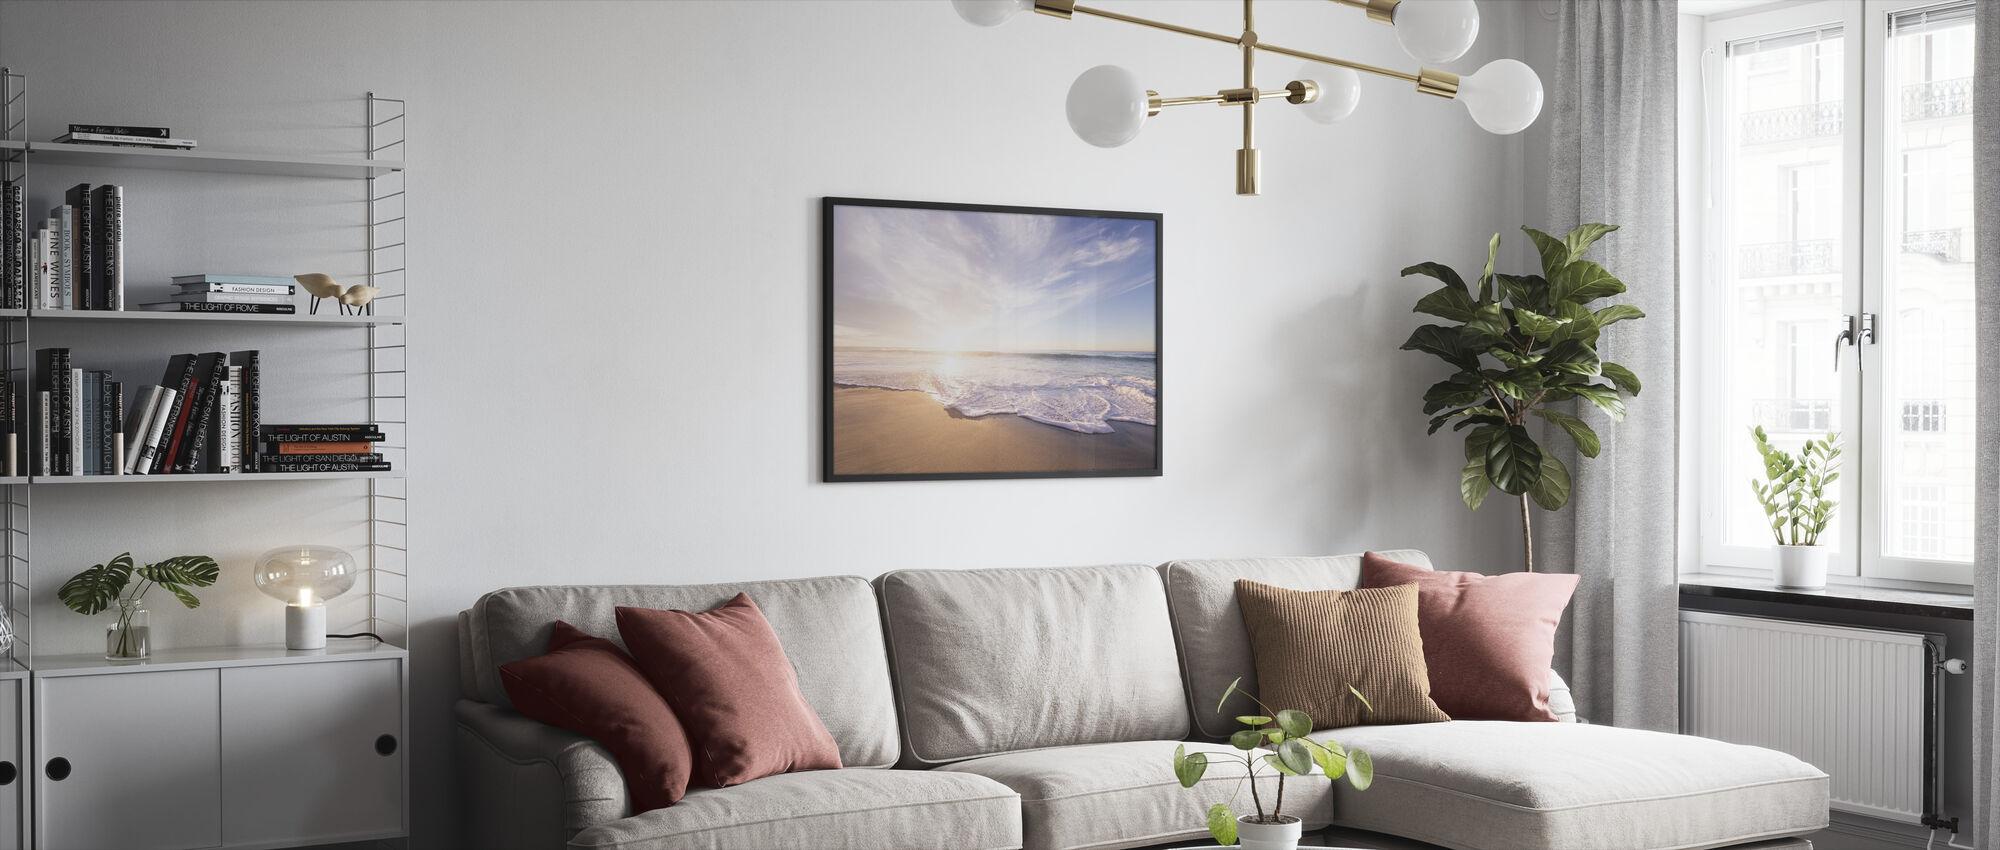 Sea Sand and Waves - Framed print - Living Room